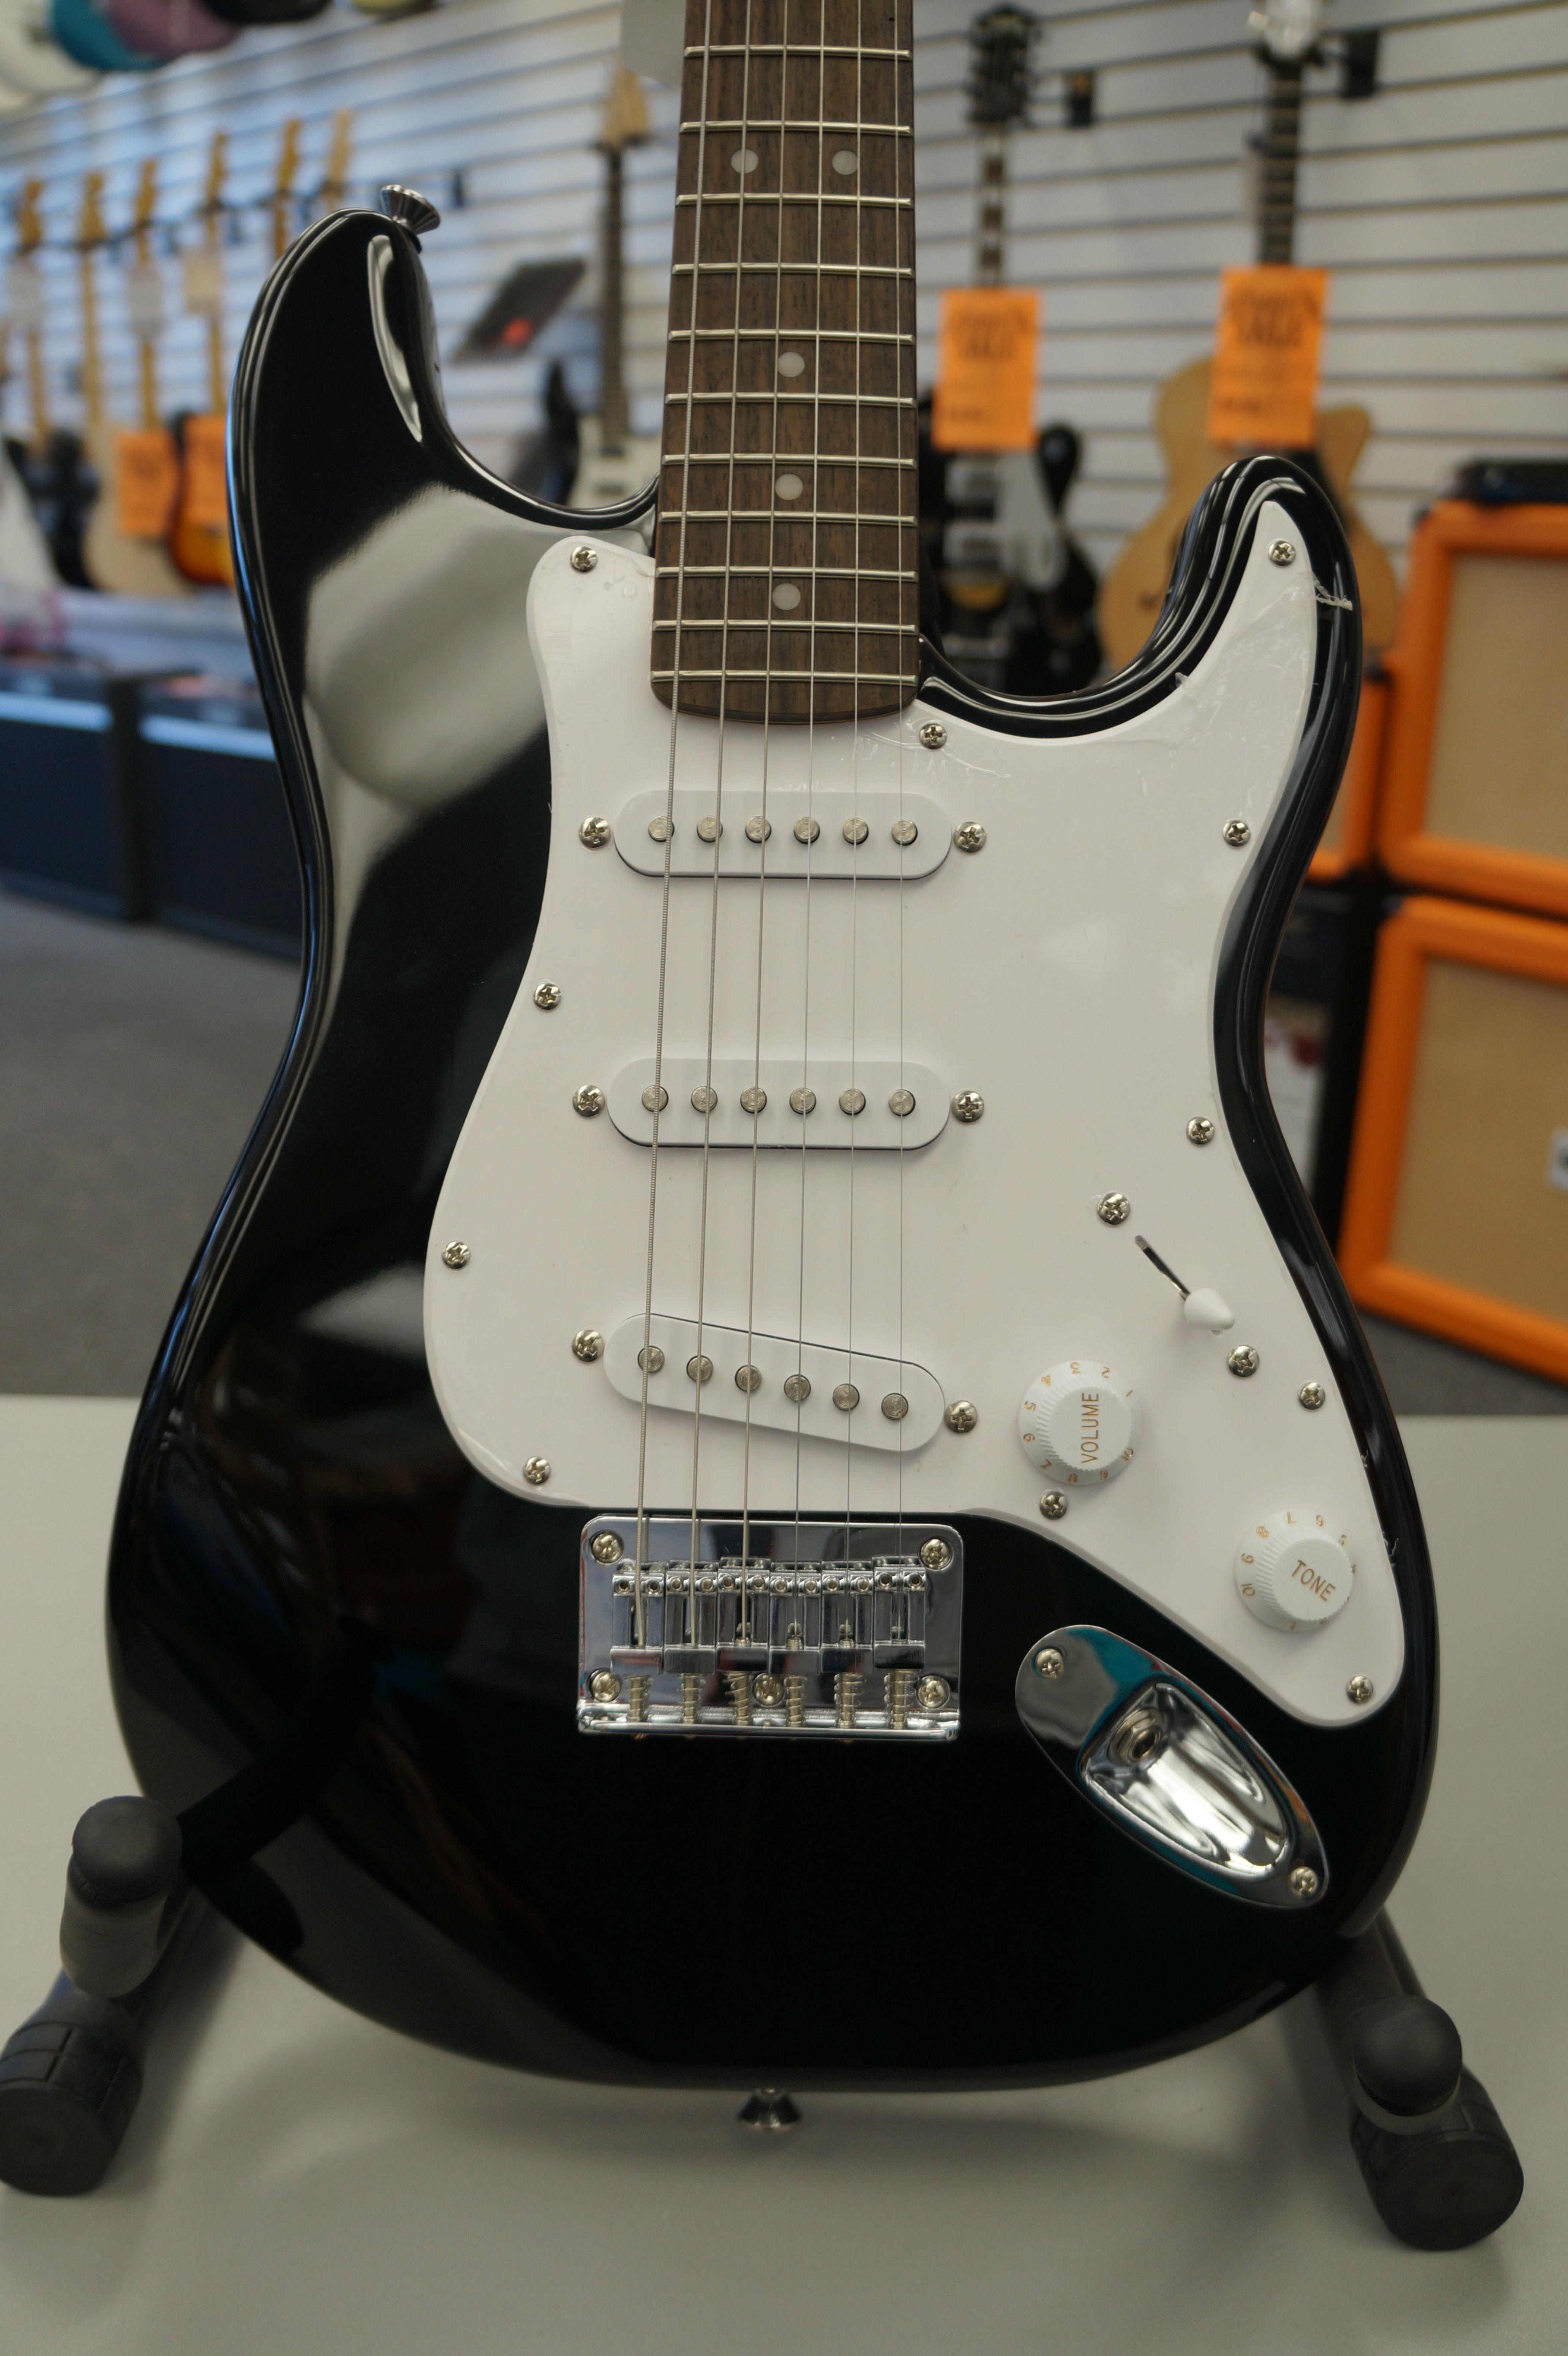 fender squier mini strat beginner electric guitar black jim laabs music store. Black Bedroom Furniture Sets. Home Design Ideas